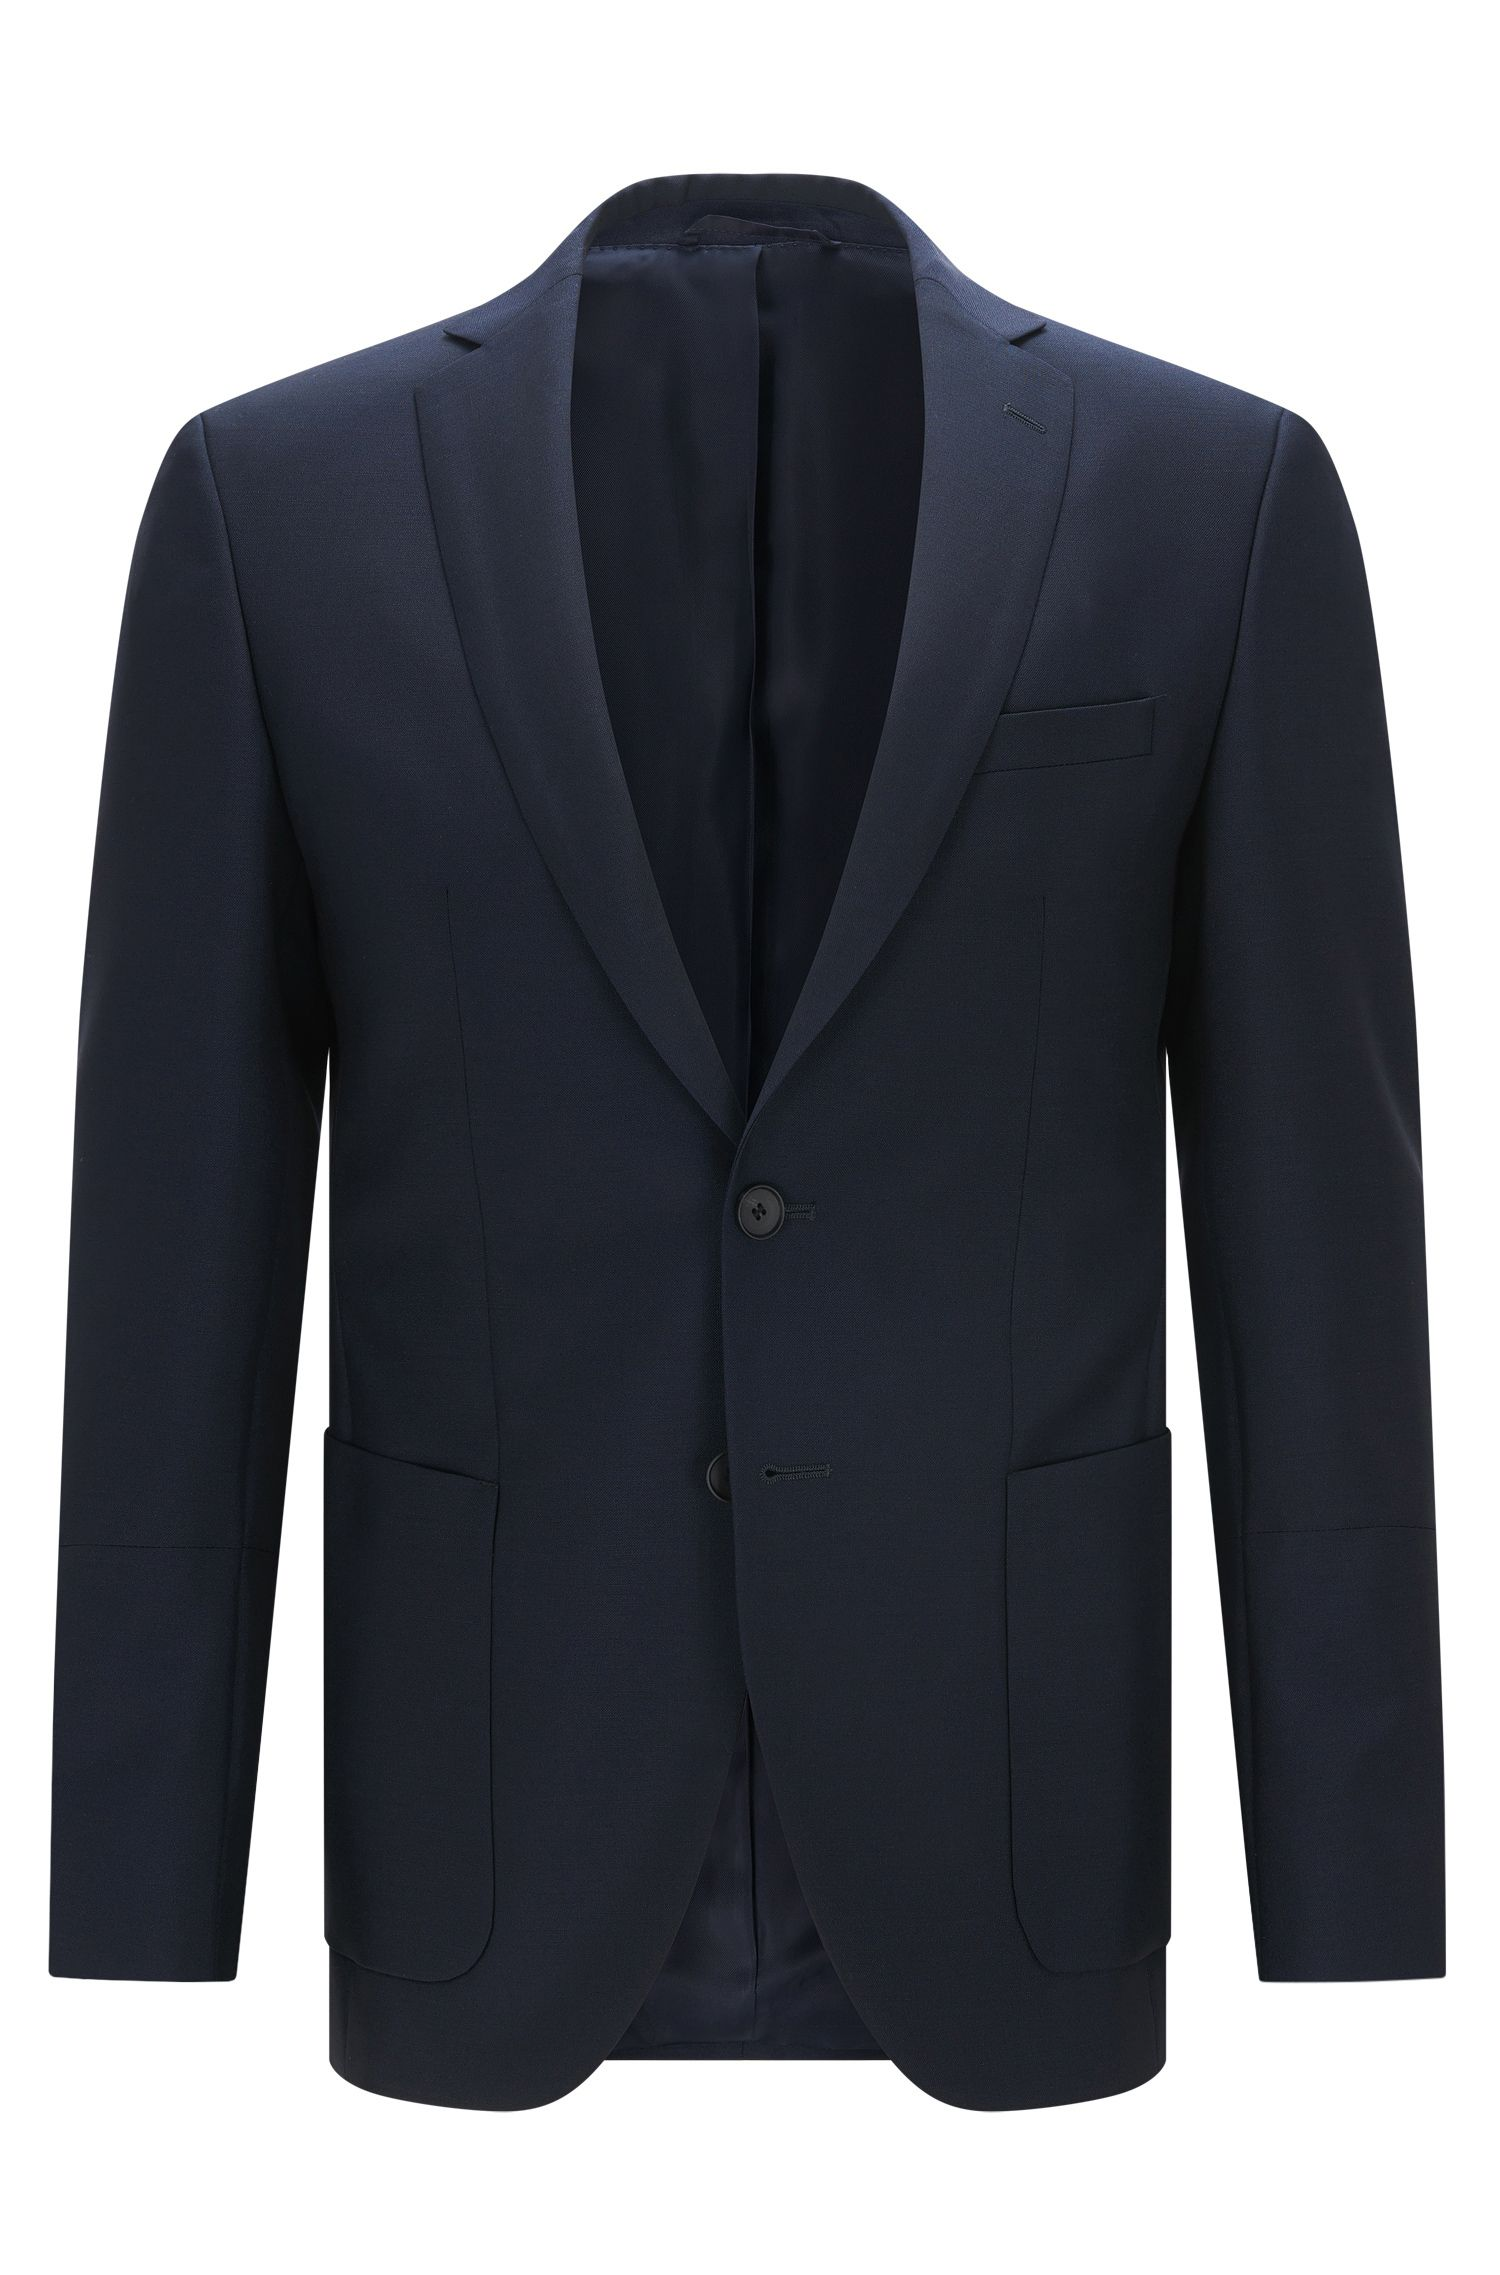 Virgin Mohair Sport Coat, Extra Slim Fit | Rodwil